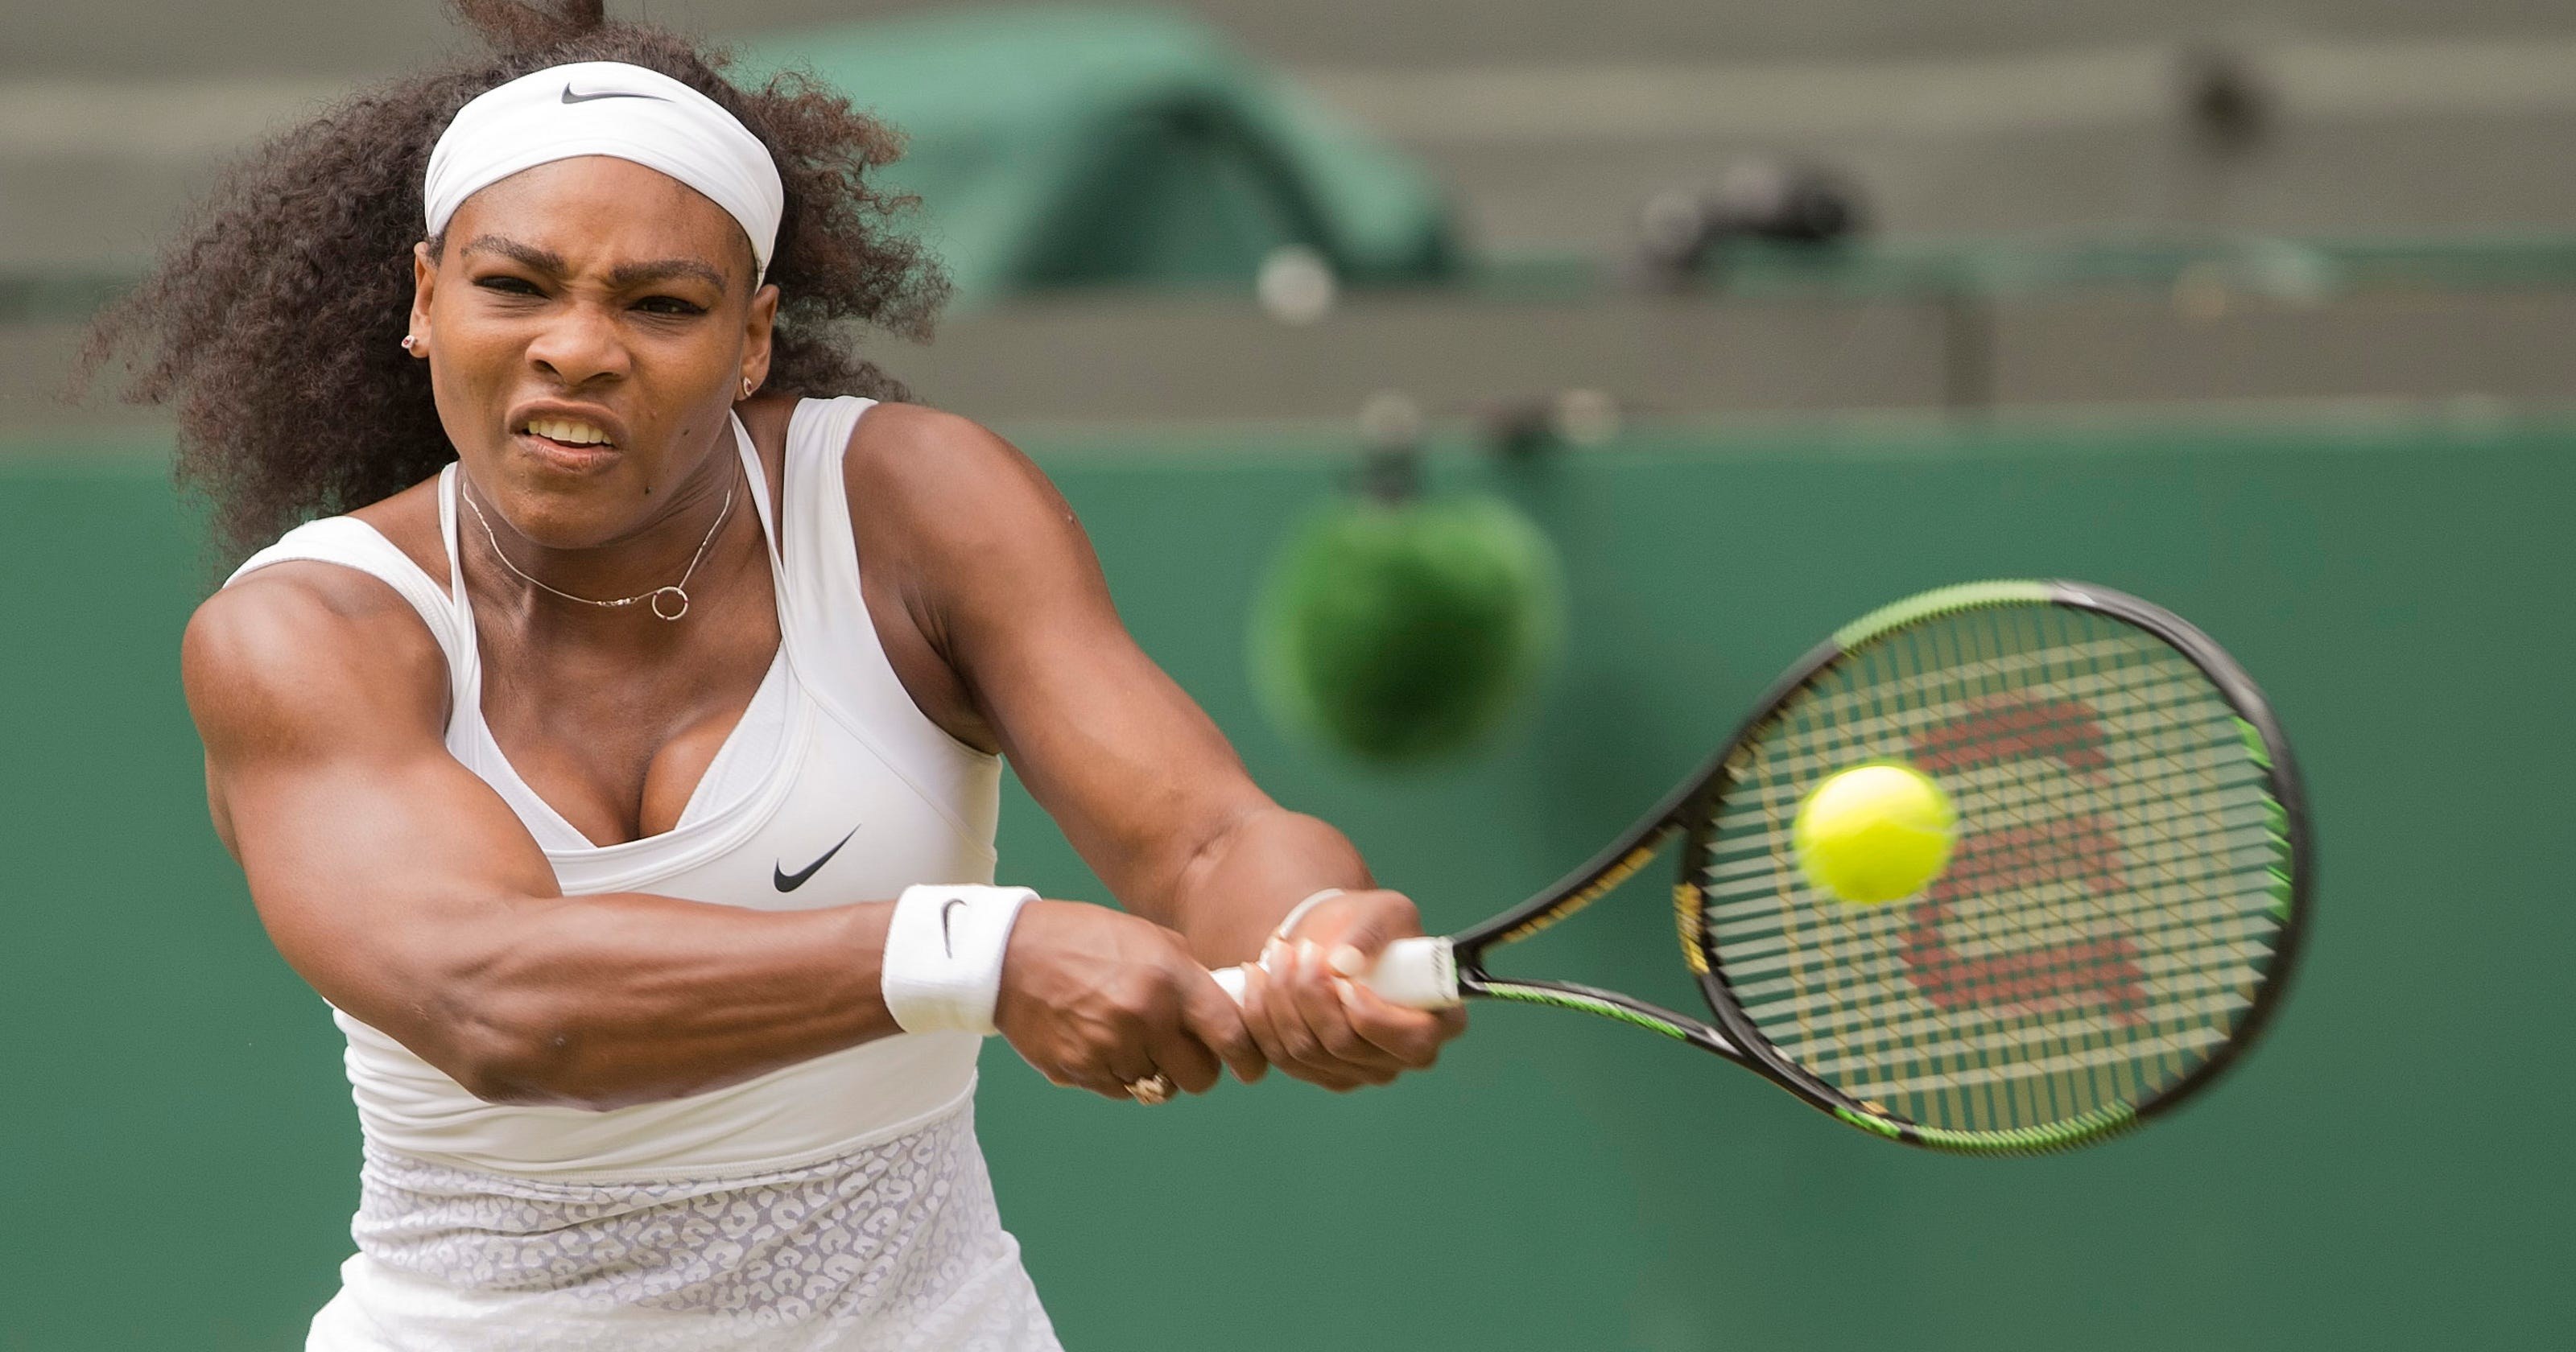 Wimbledon Williams Sisters Wow >> Serena Williams Has Tough Road To Wimbledon Title With Azarenka Up Next